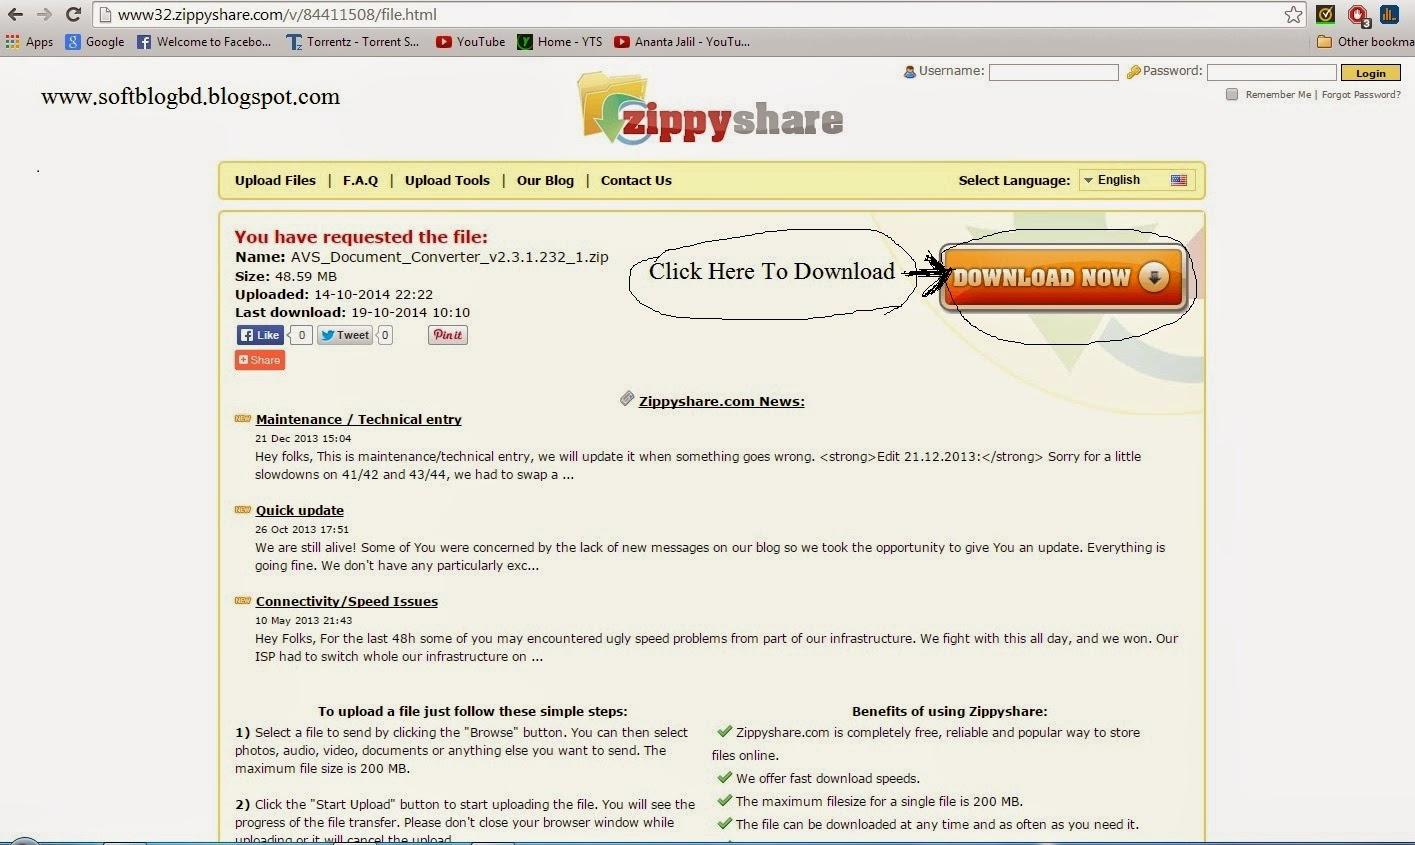 Soft-Blog-BD !! Digital World IT - Free Software Downloads